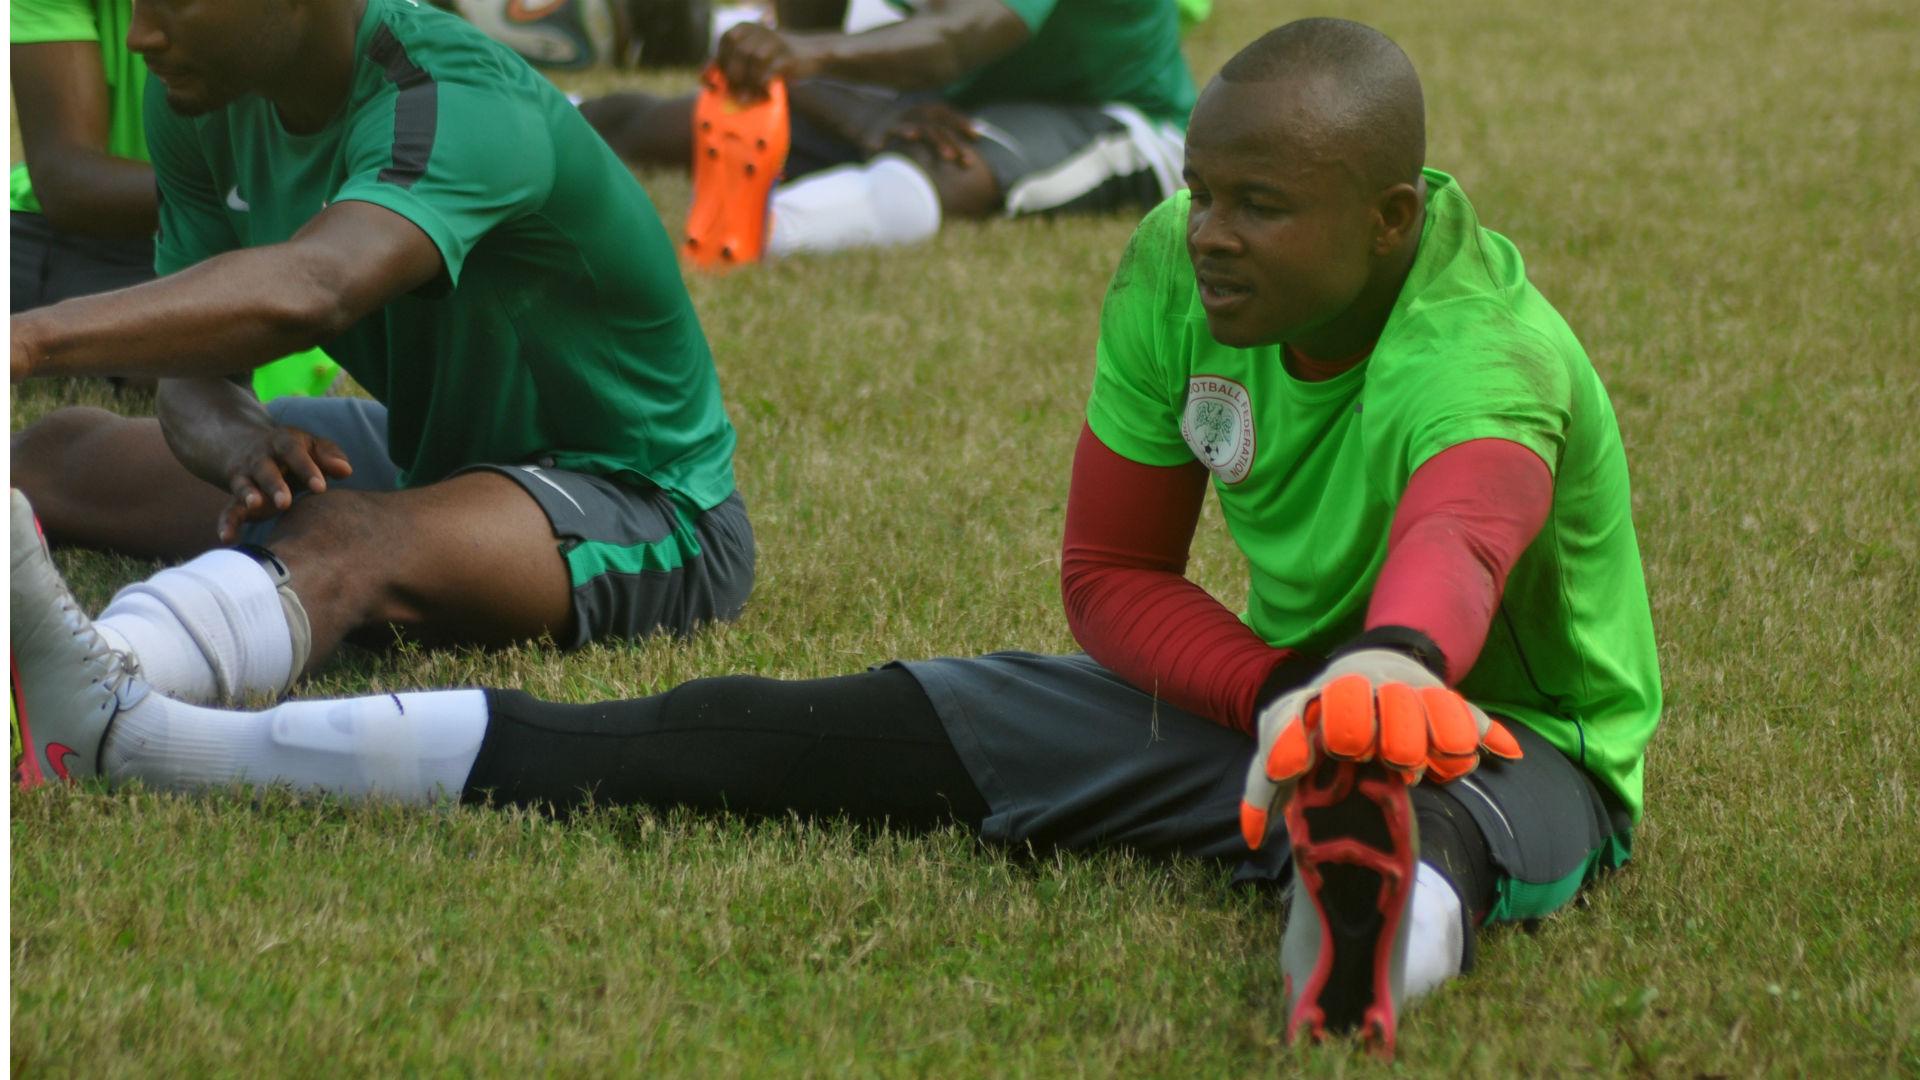 Ikechukwu Ezenwa